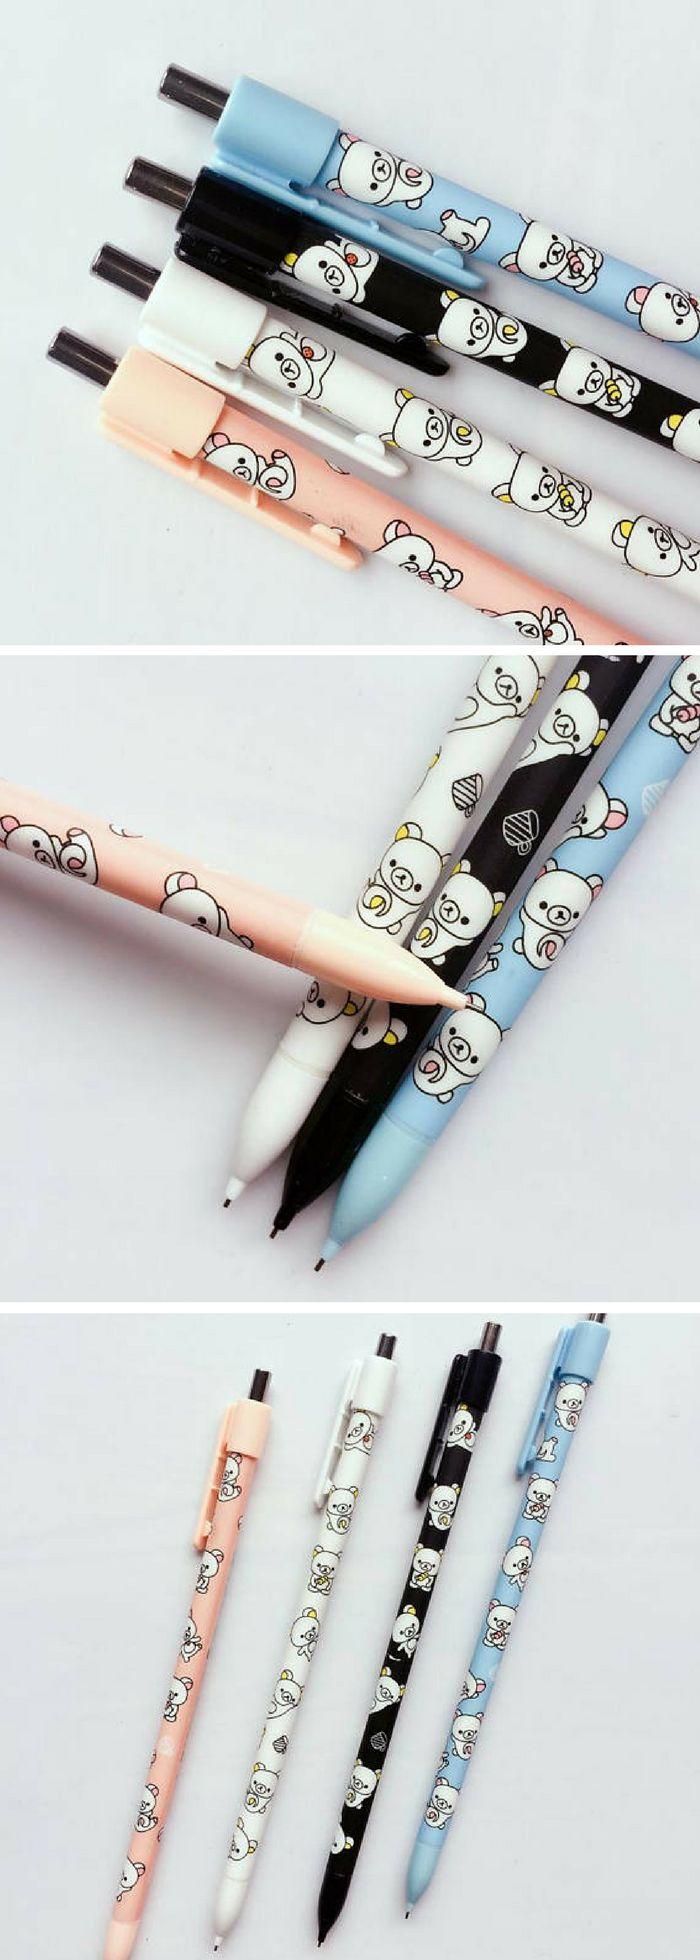 Rilakkuma design mechanical pencils! Omg I love Japanese stationery and rilakkuma is one of my favourite characters. Need these! #ad #kawaii #stationery #rilakkuma